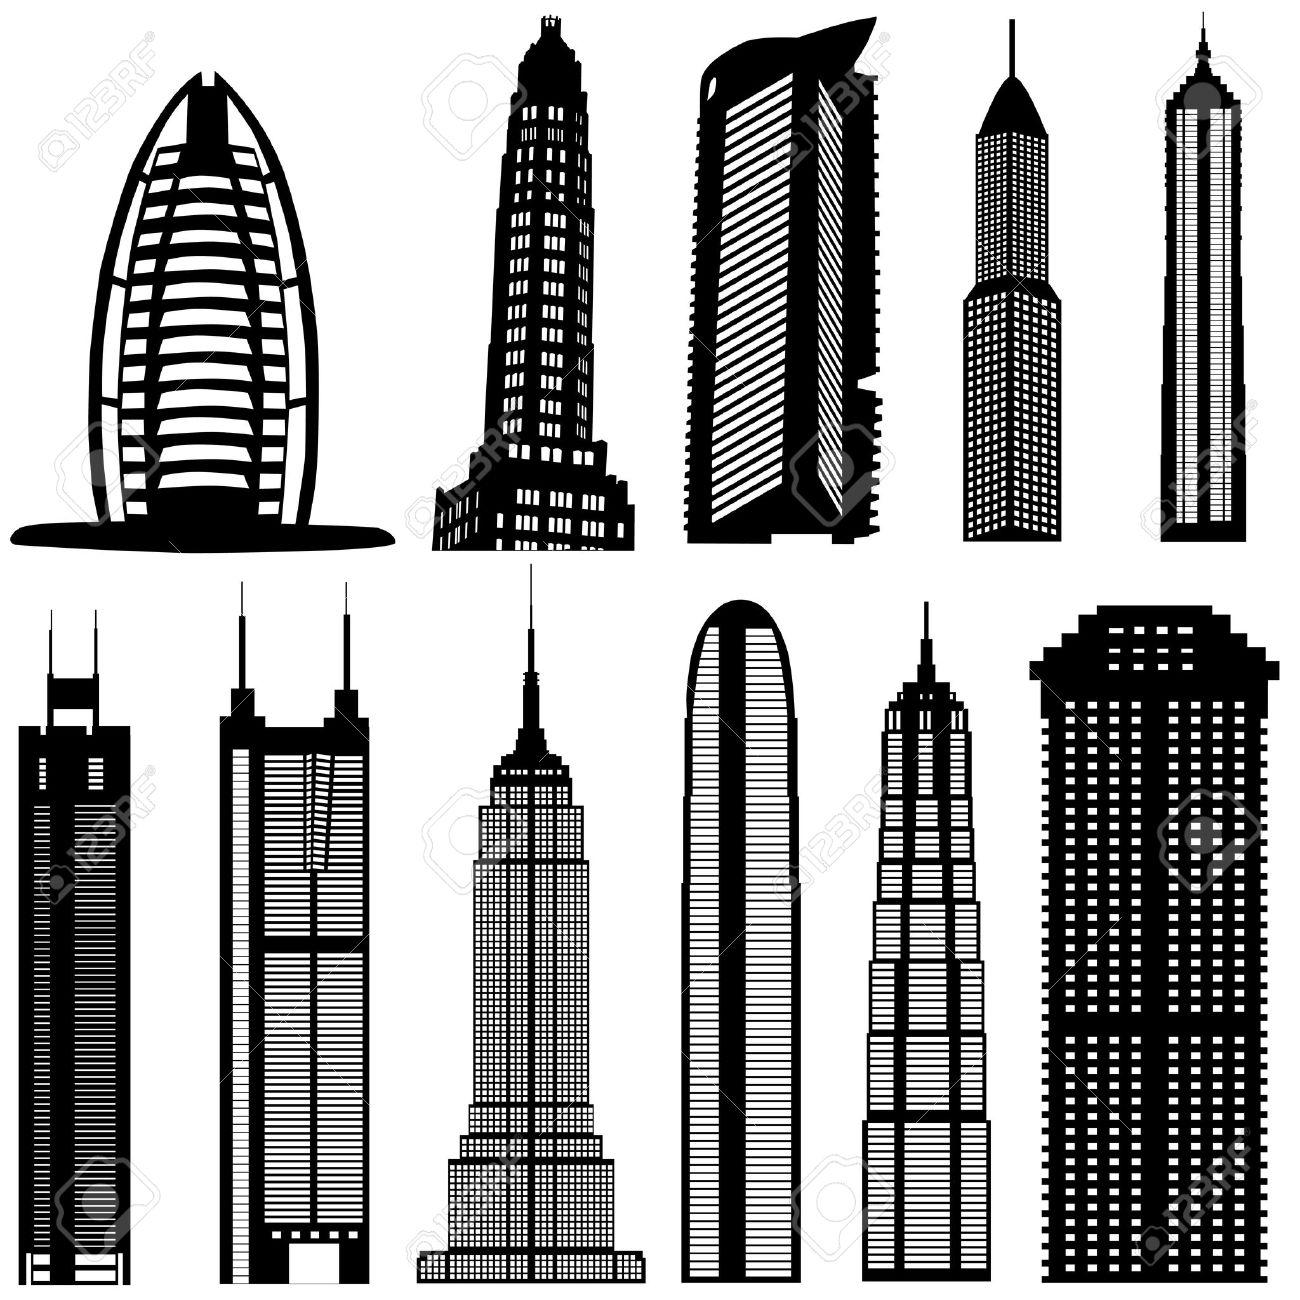 skyscraper buildings vector royalty free cliparts vectors and rh 123rf com skyscraper silhouette vector skyscraper silhouette vector